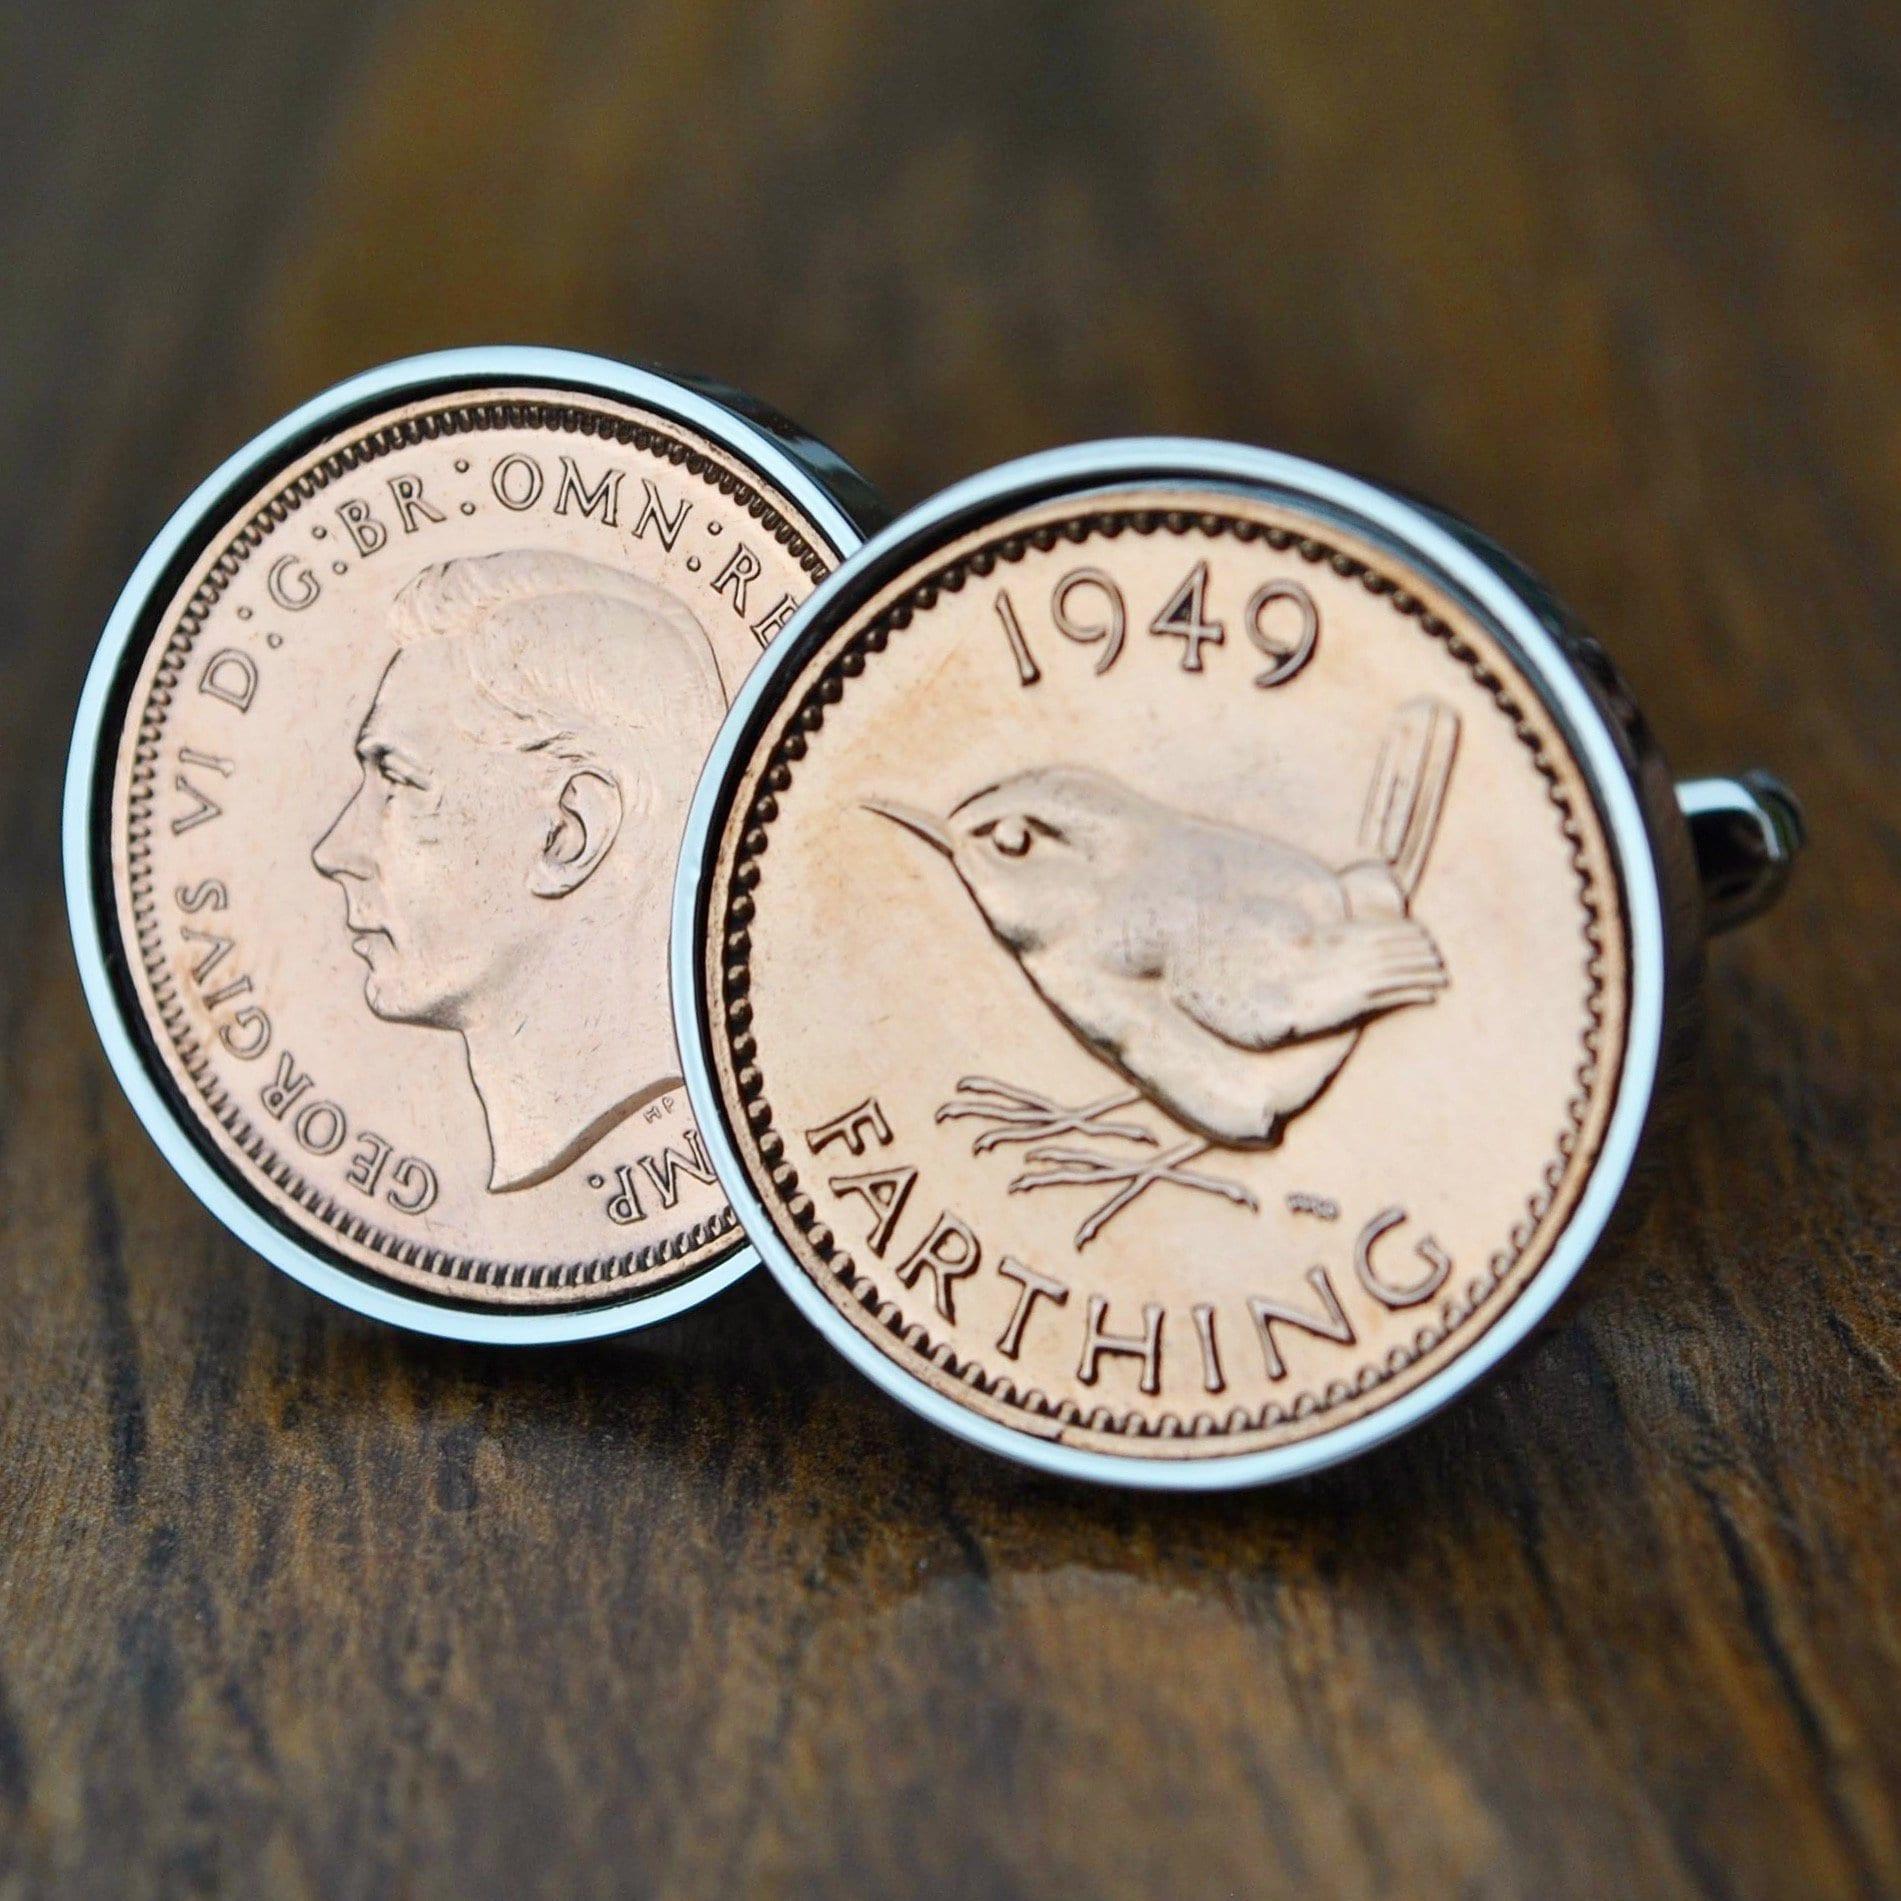 70th Birthday Gift Him 1949 Cufflinks Farthing Born In Coin CufflinksMens Anniversary Dad